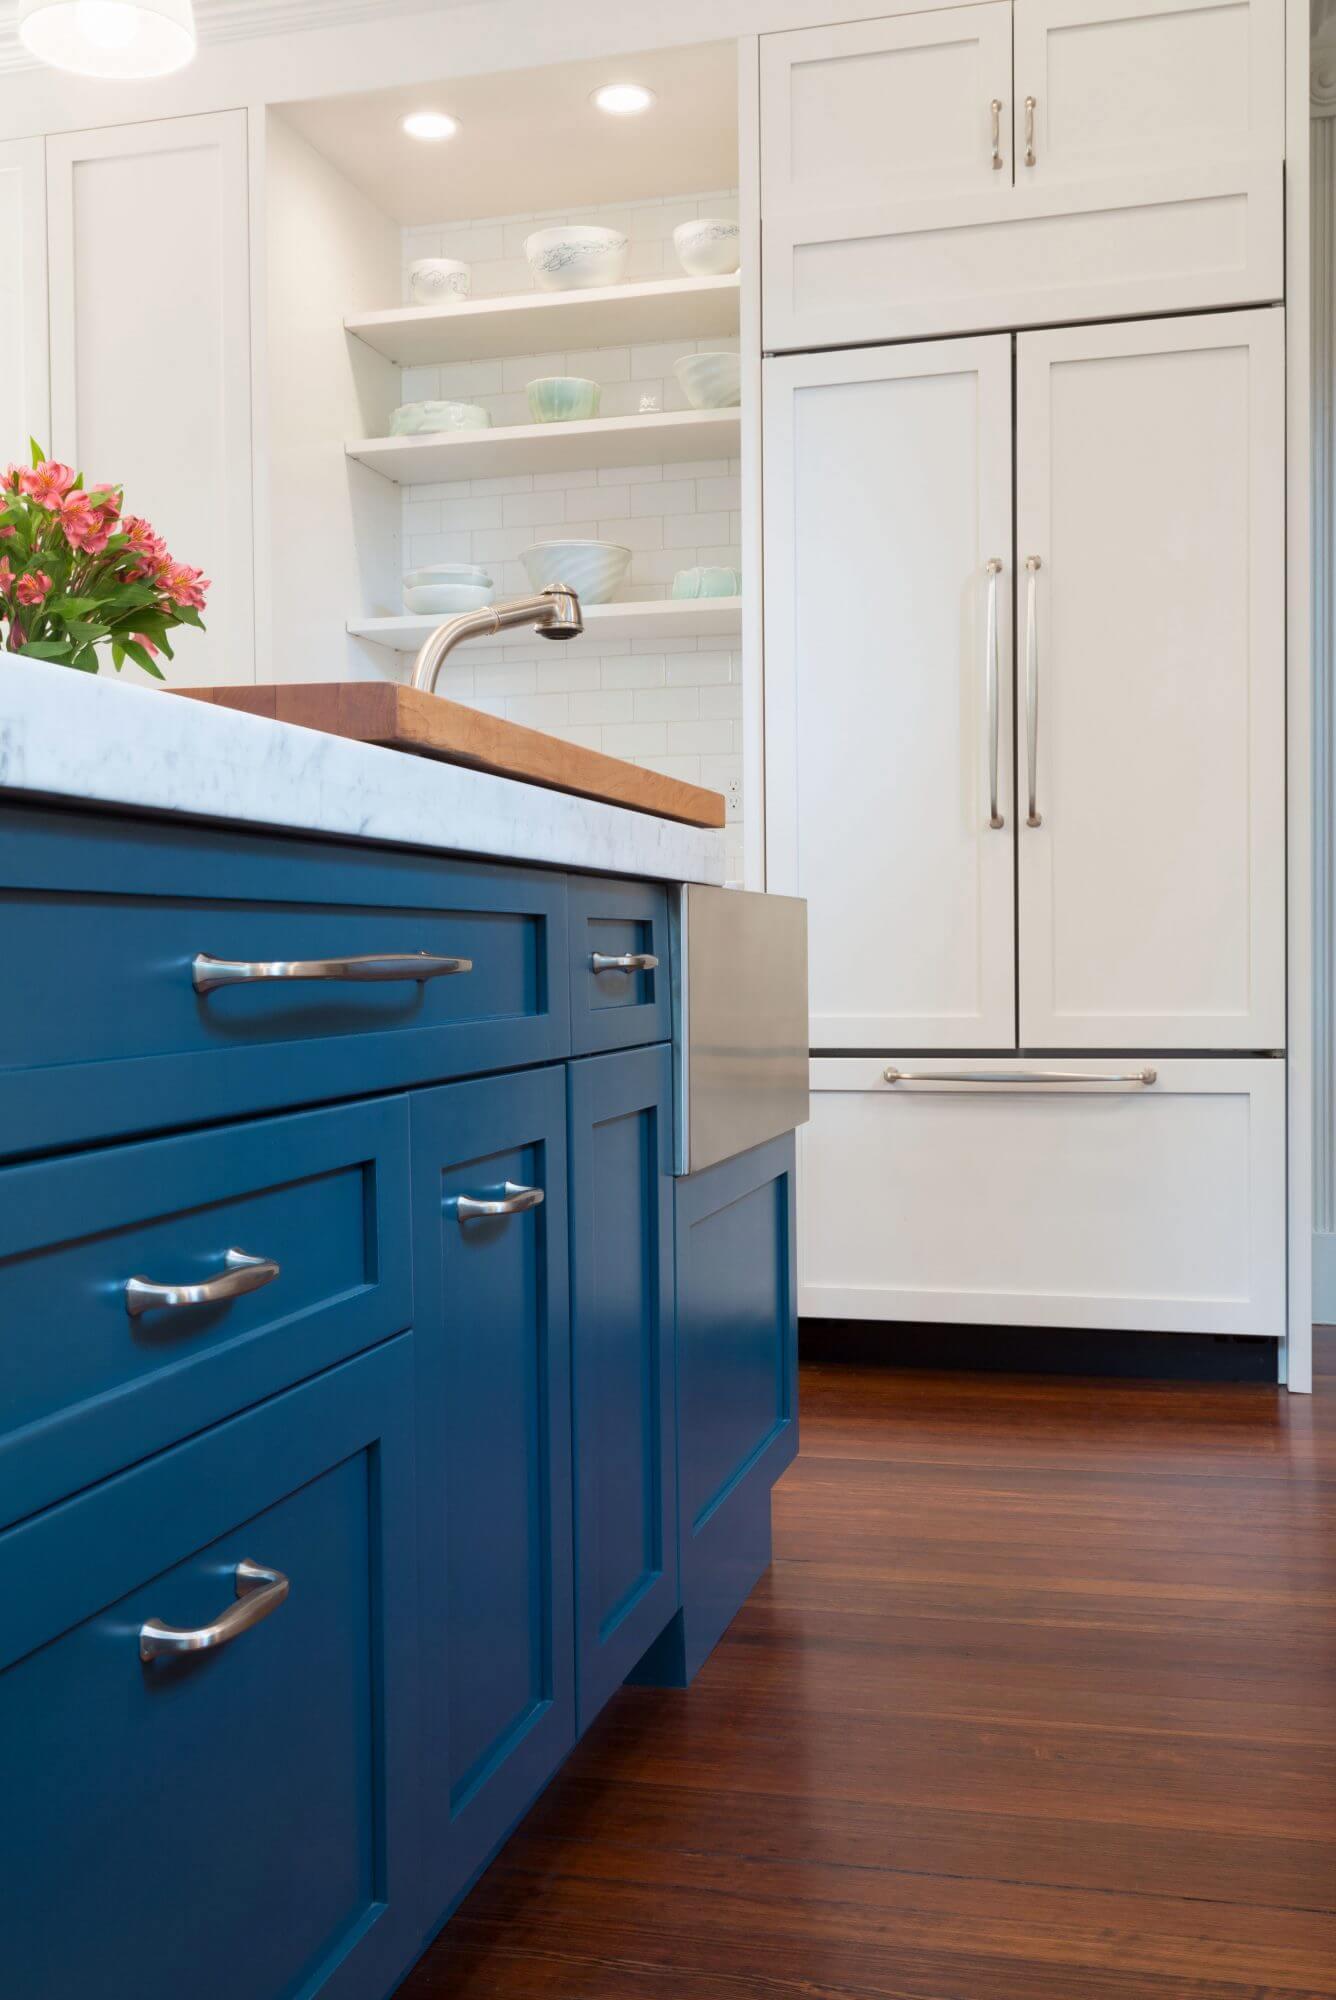 Hague blue kitchen cabinets.